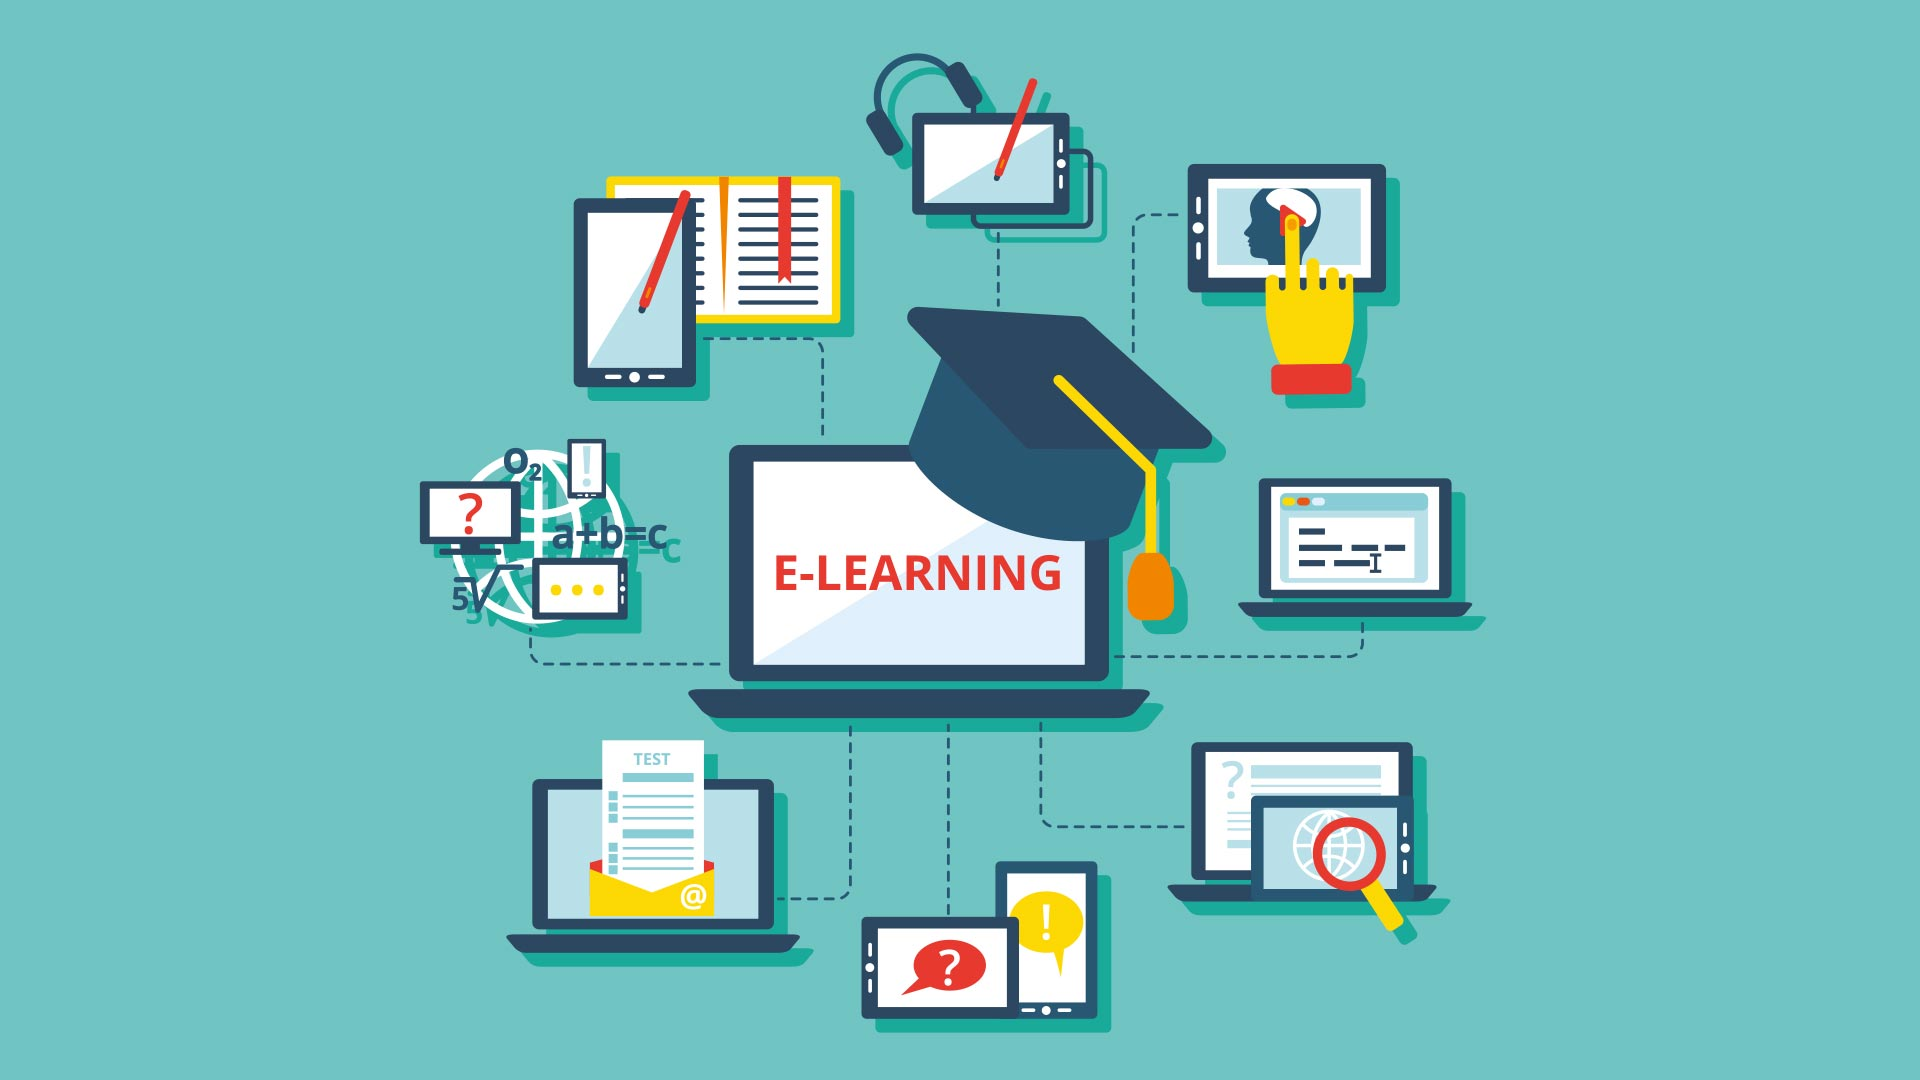 Aprendizaje Electronico E Learning - HD Wallpaper